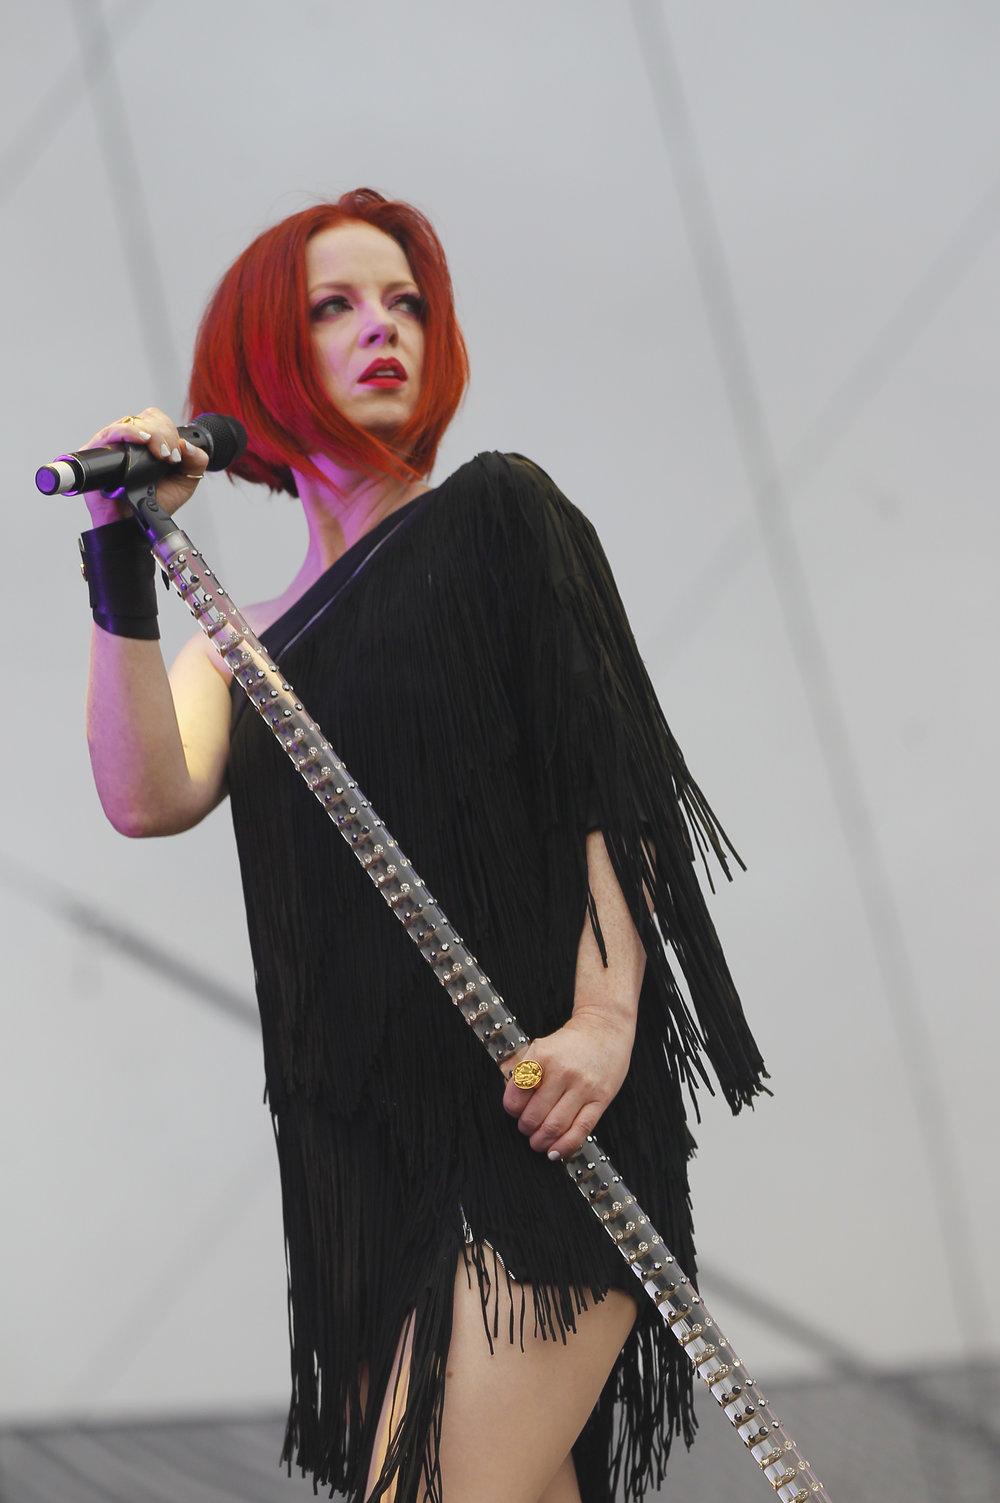 Shirley Manson-Garbage